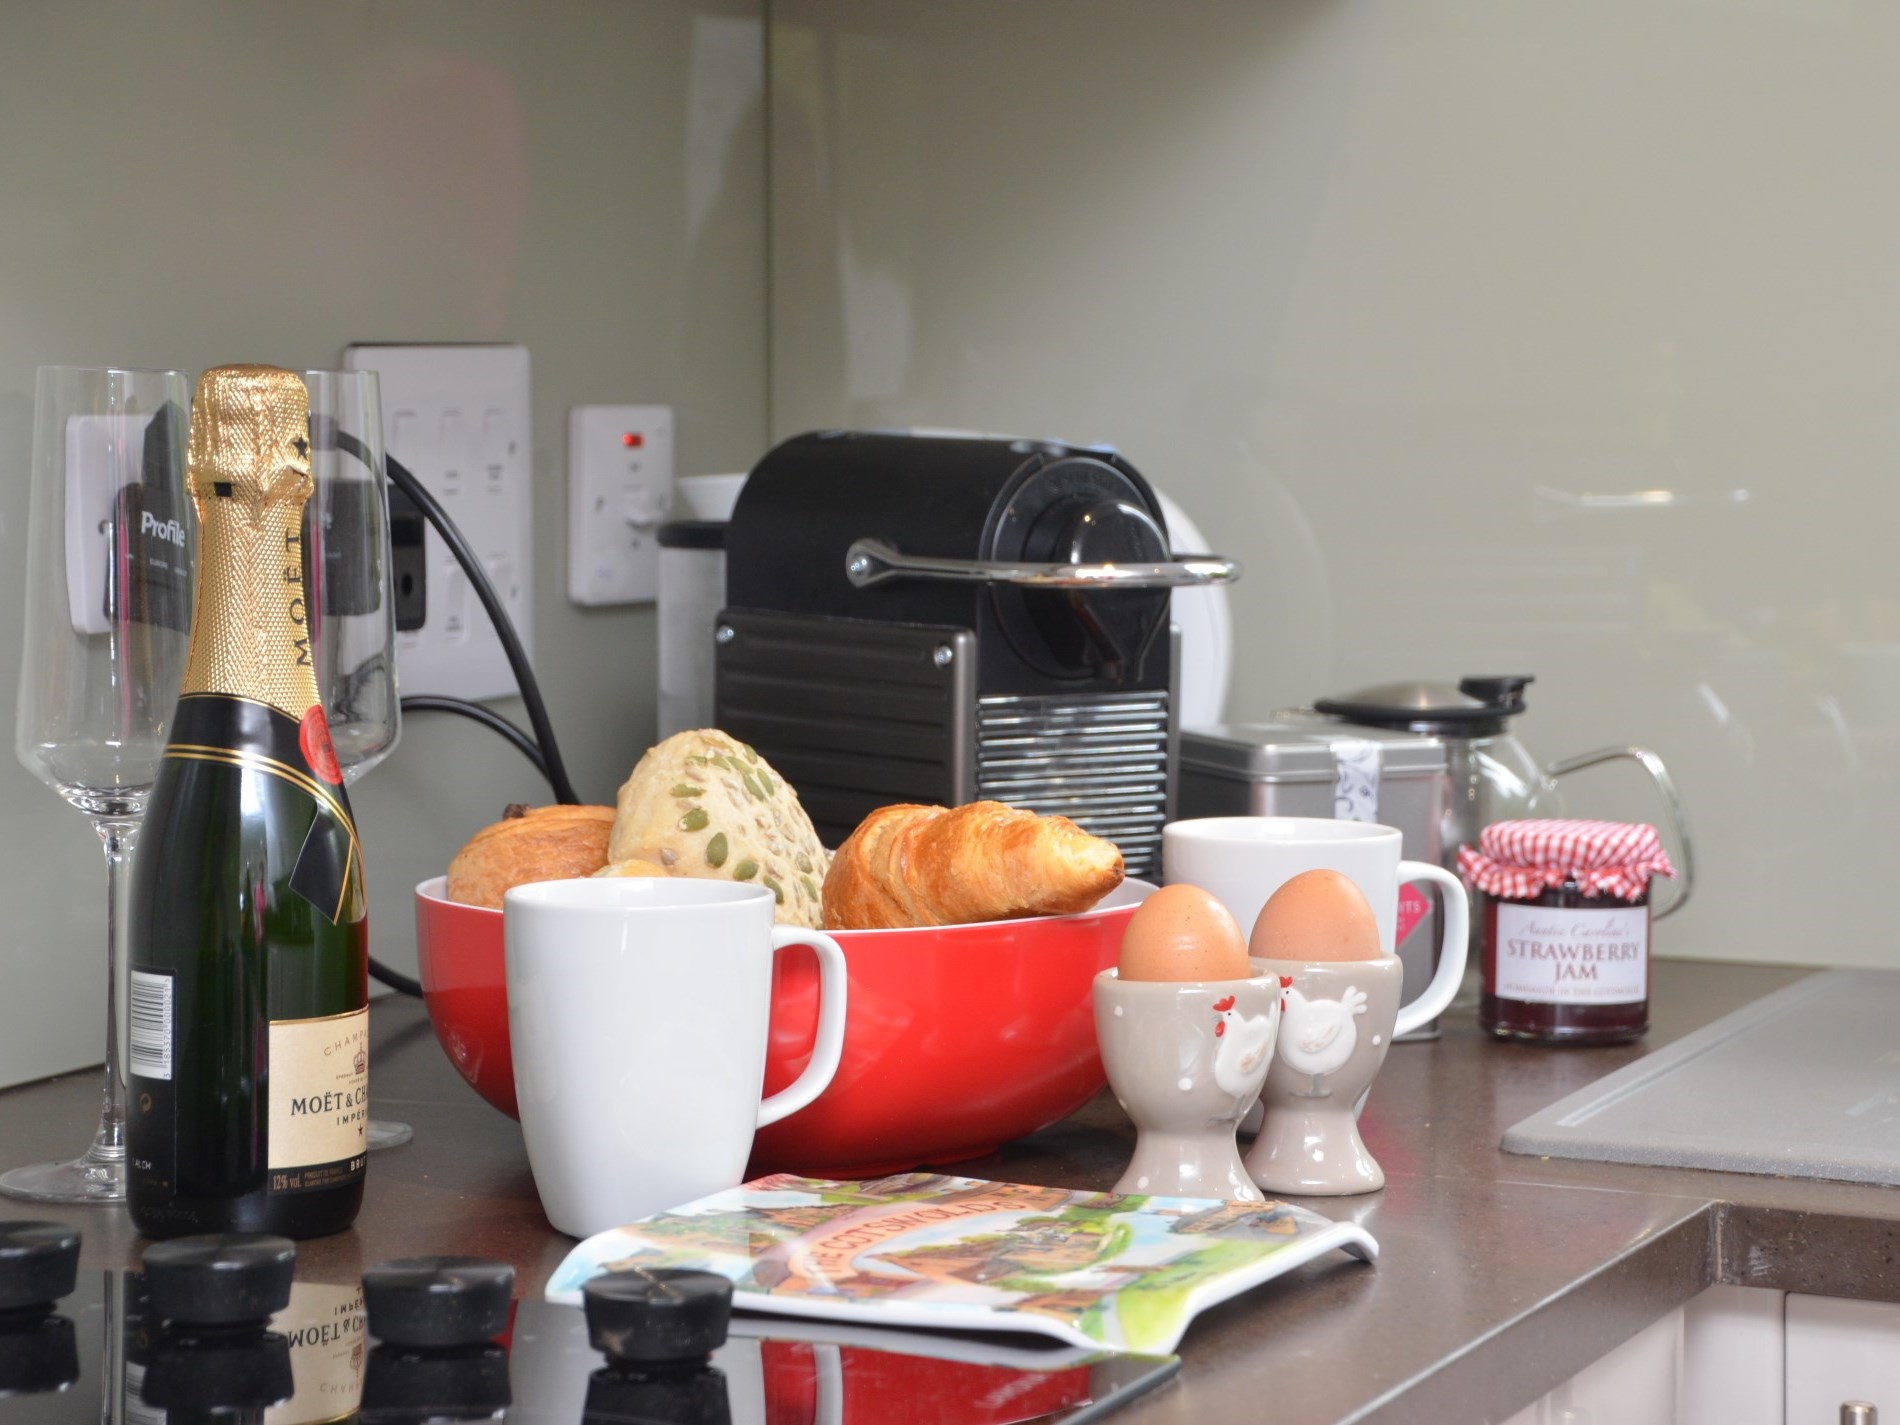 Enjoying a luxurious breakfast